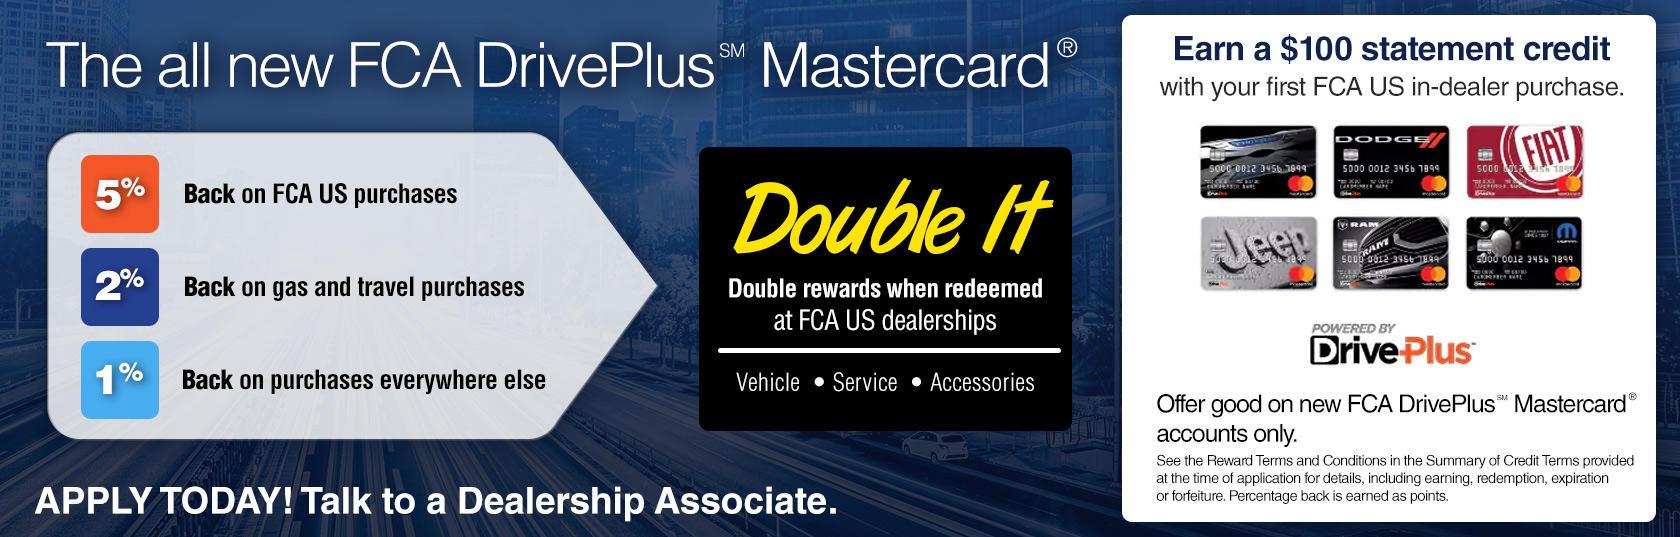 ea7a21c03 FCA DrivePlus Mastercard | St. Clair Chrysler Jeep Dodge Ram